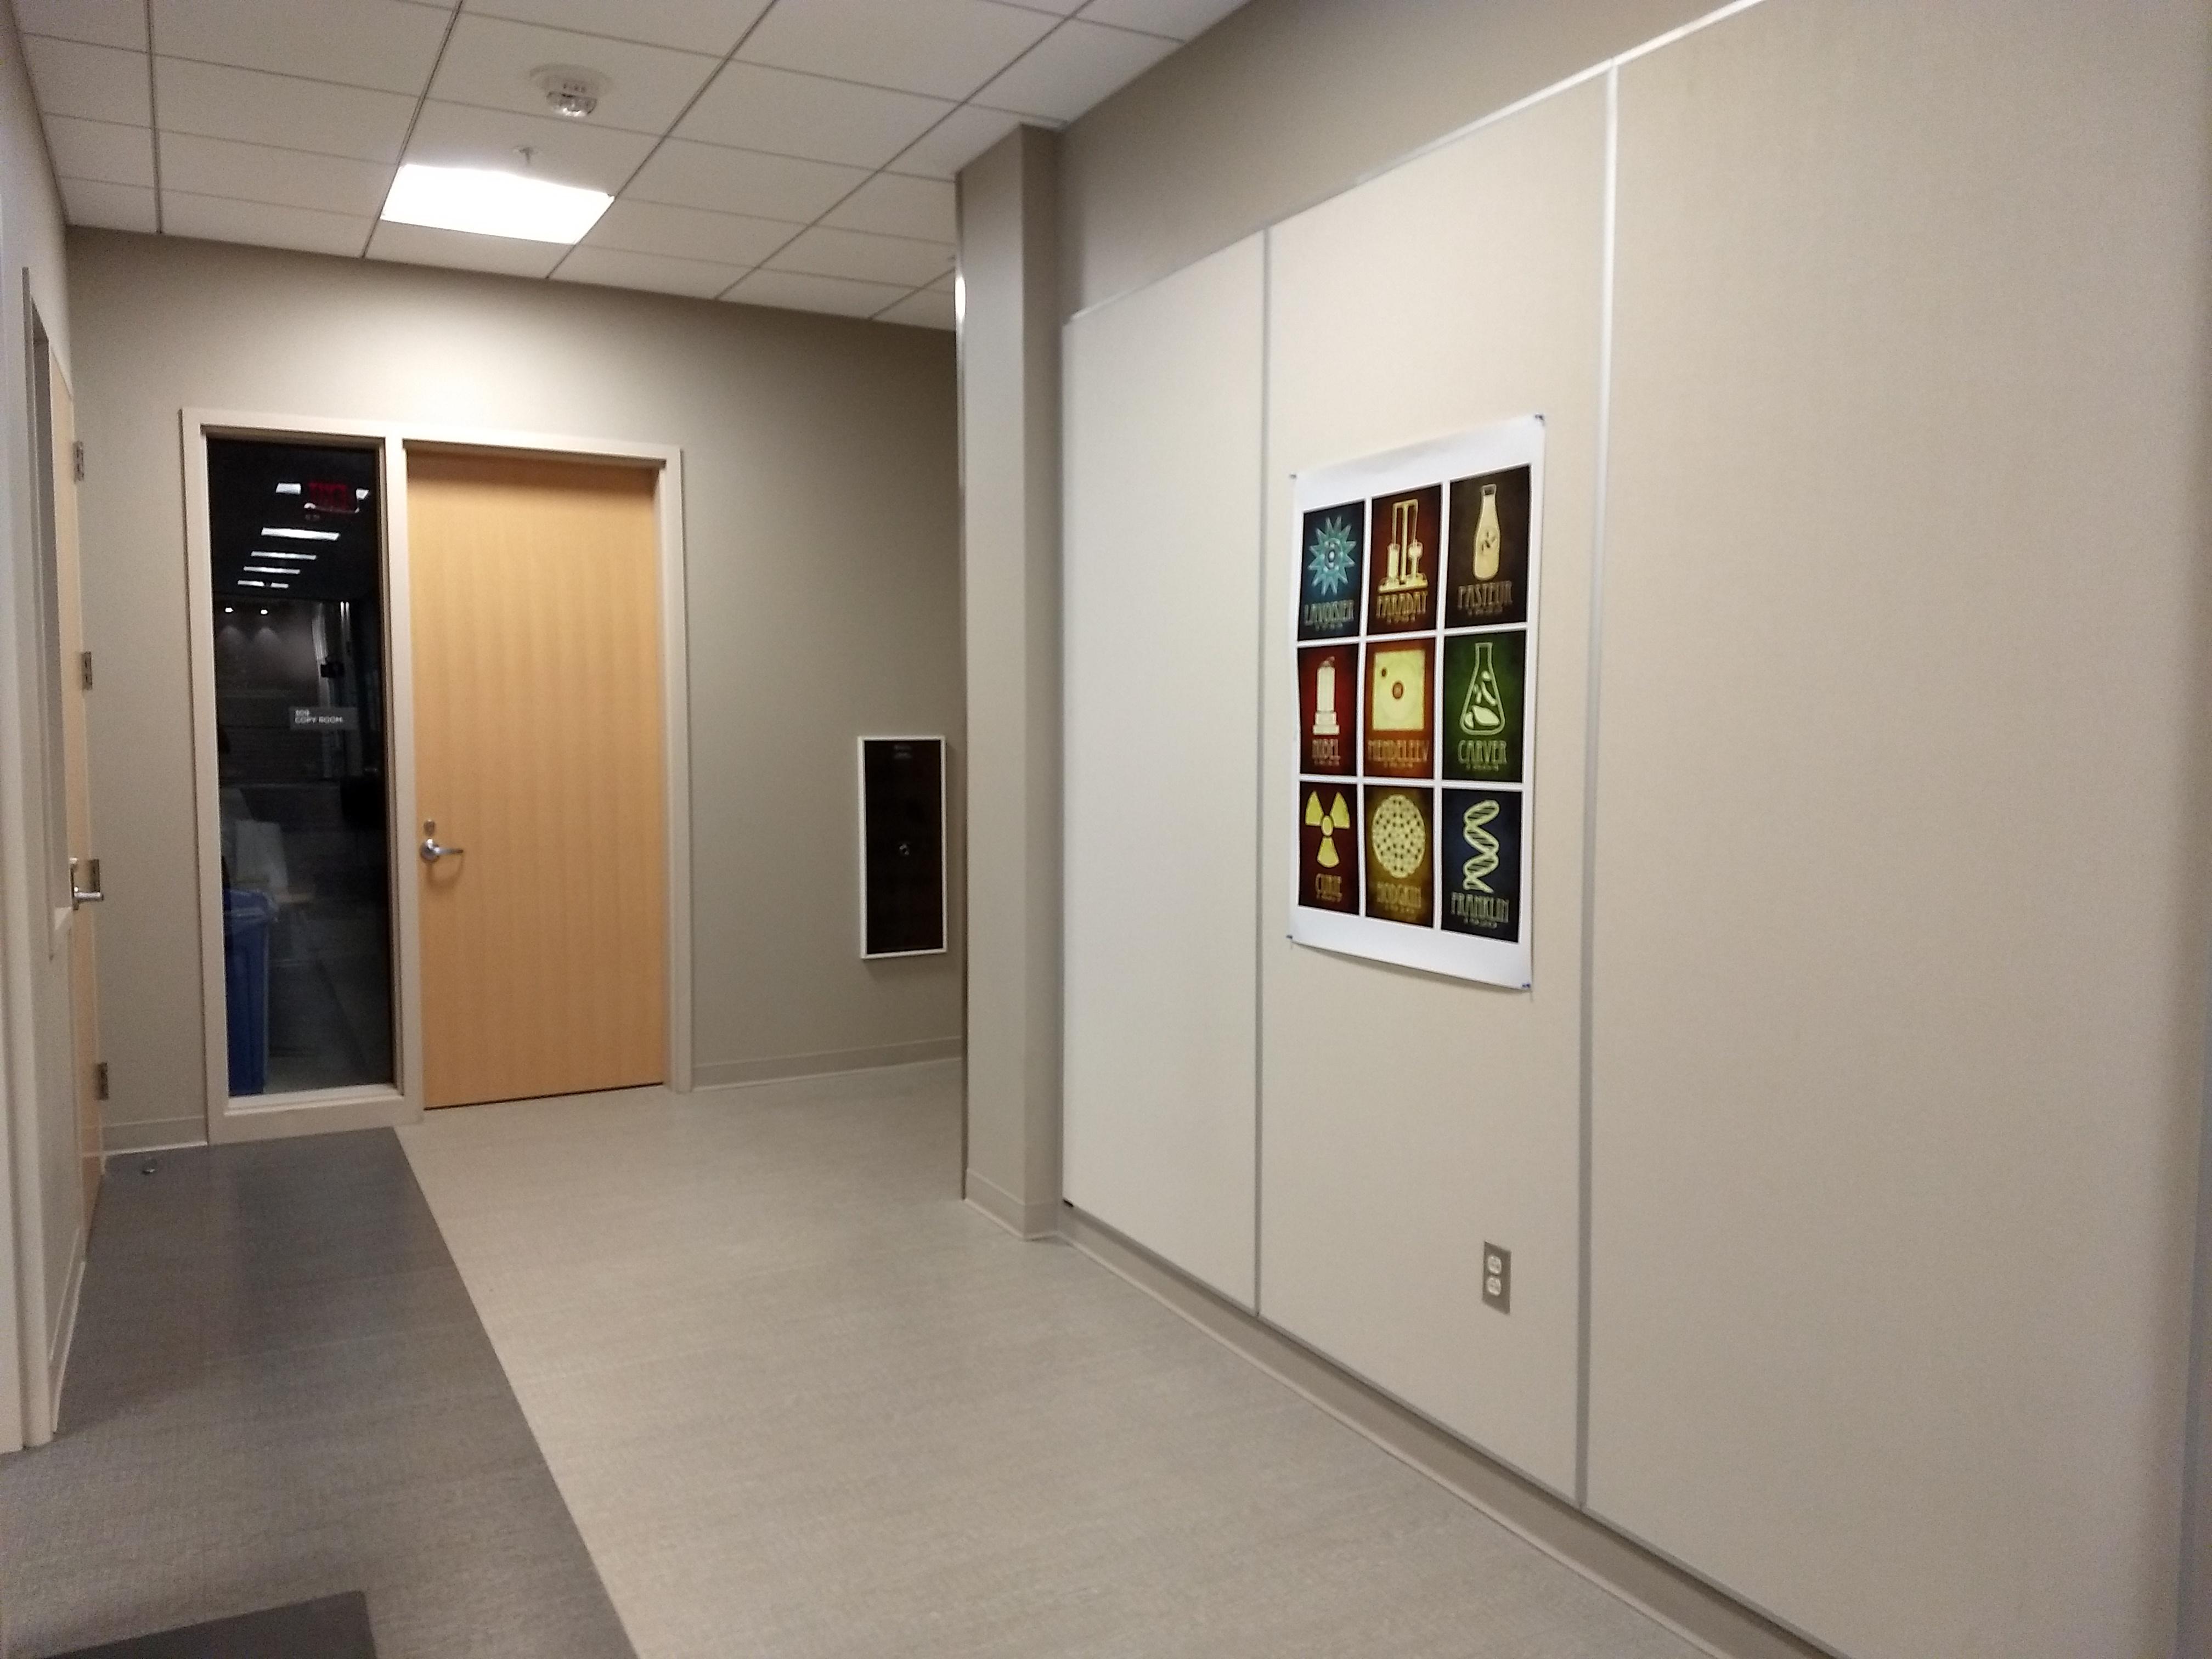 3rd floor near room 309 copy room